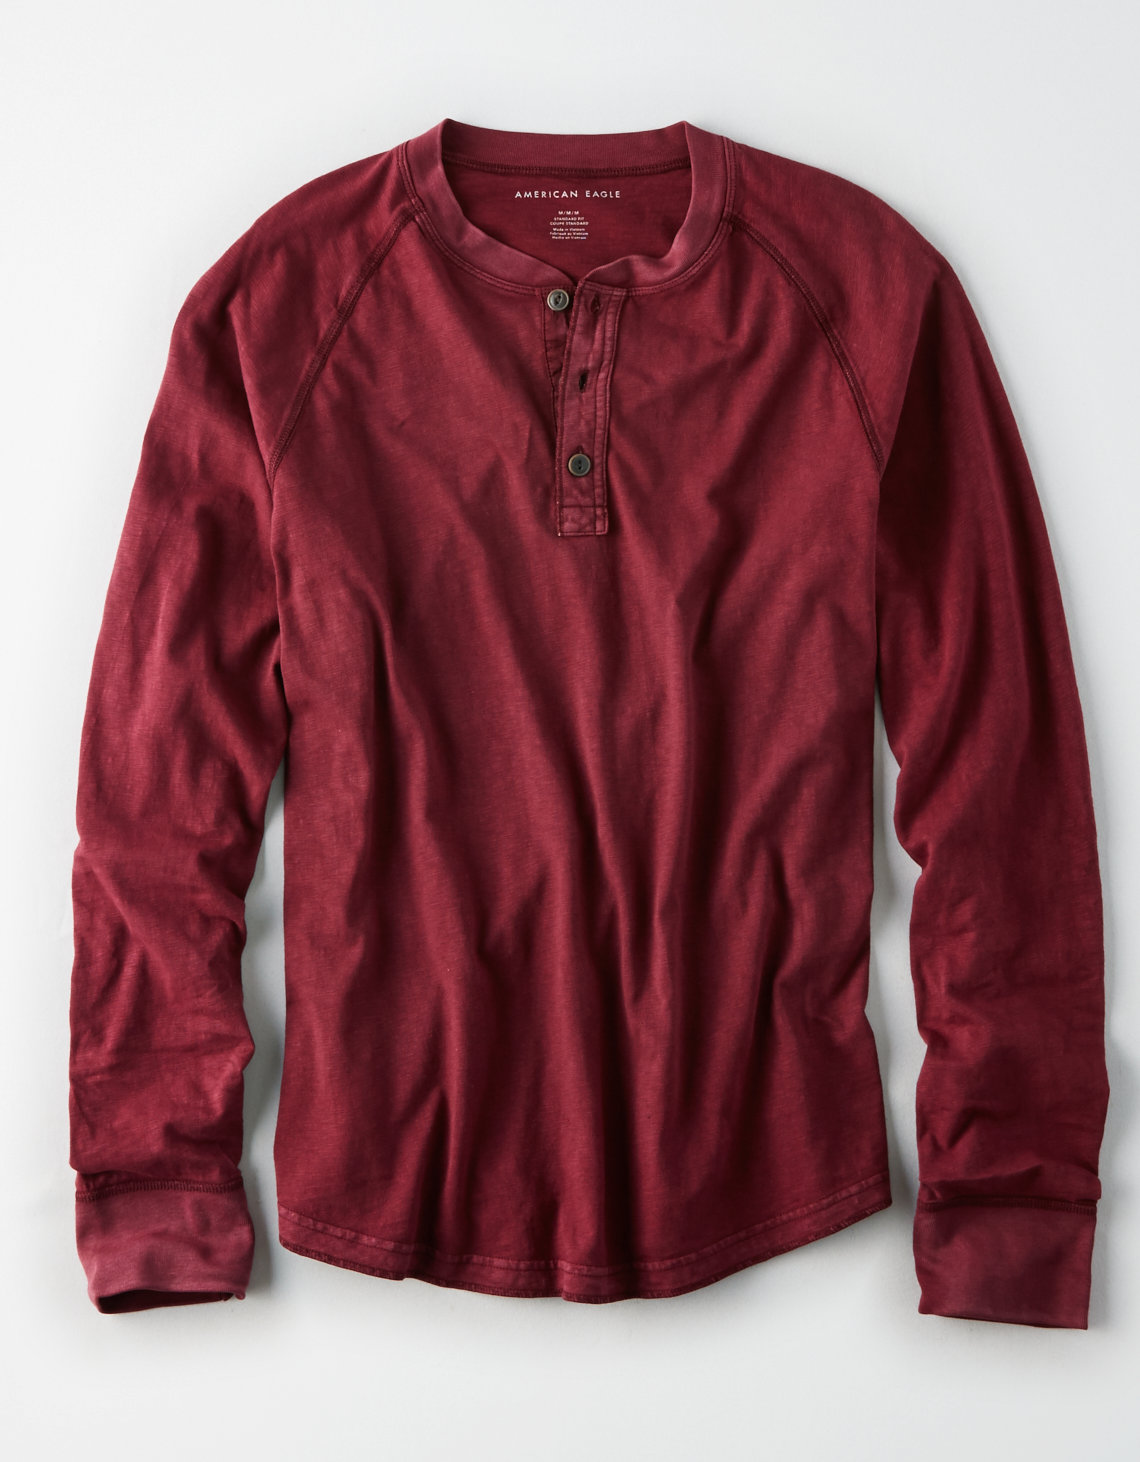 Qualcosa Prodotto Manica Lunga T-shirt M3smZit8